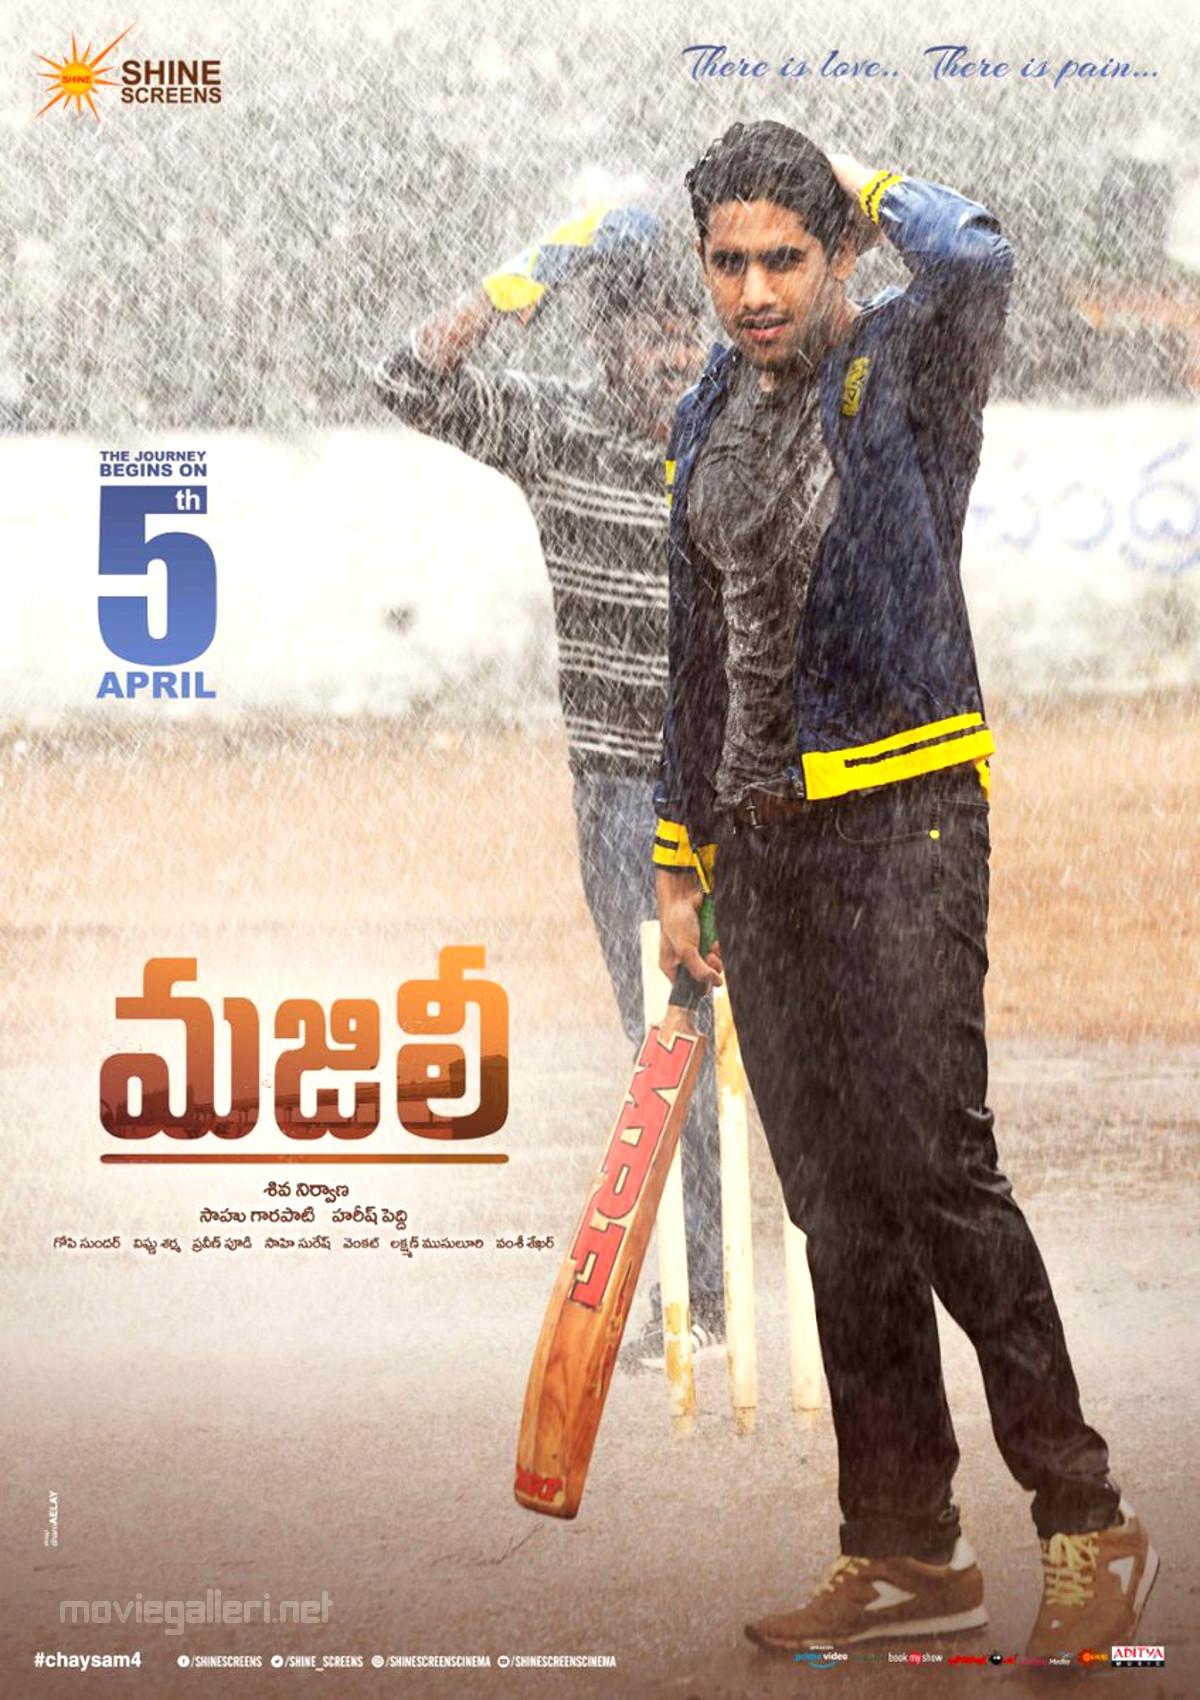 Naga Chaitanya Majili Release Date on 5th April Poster HD